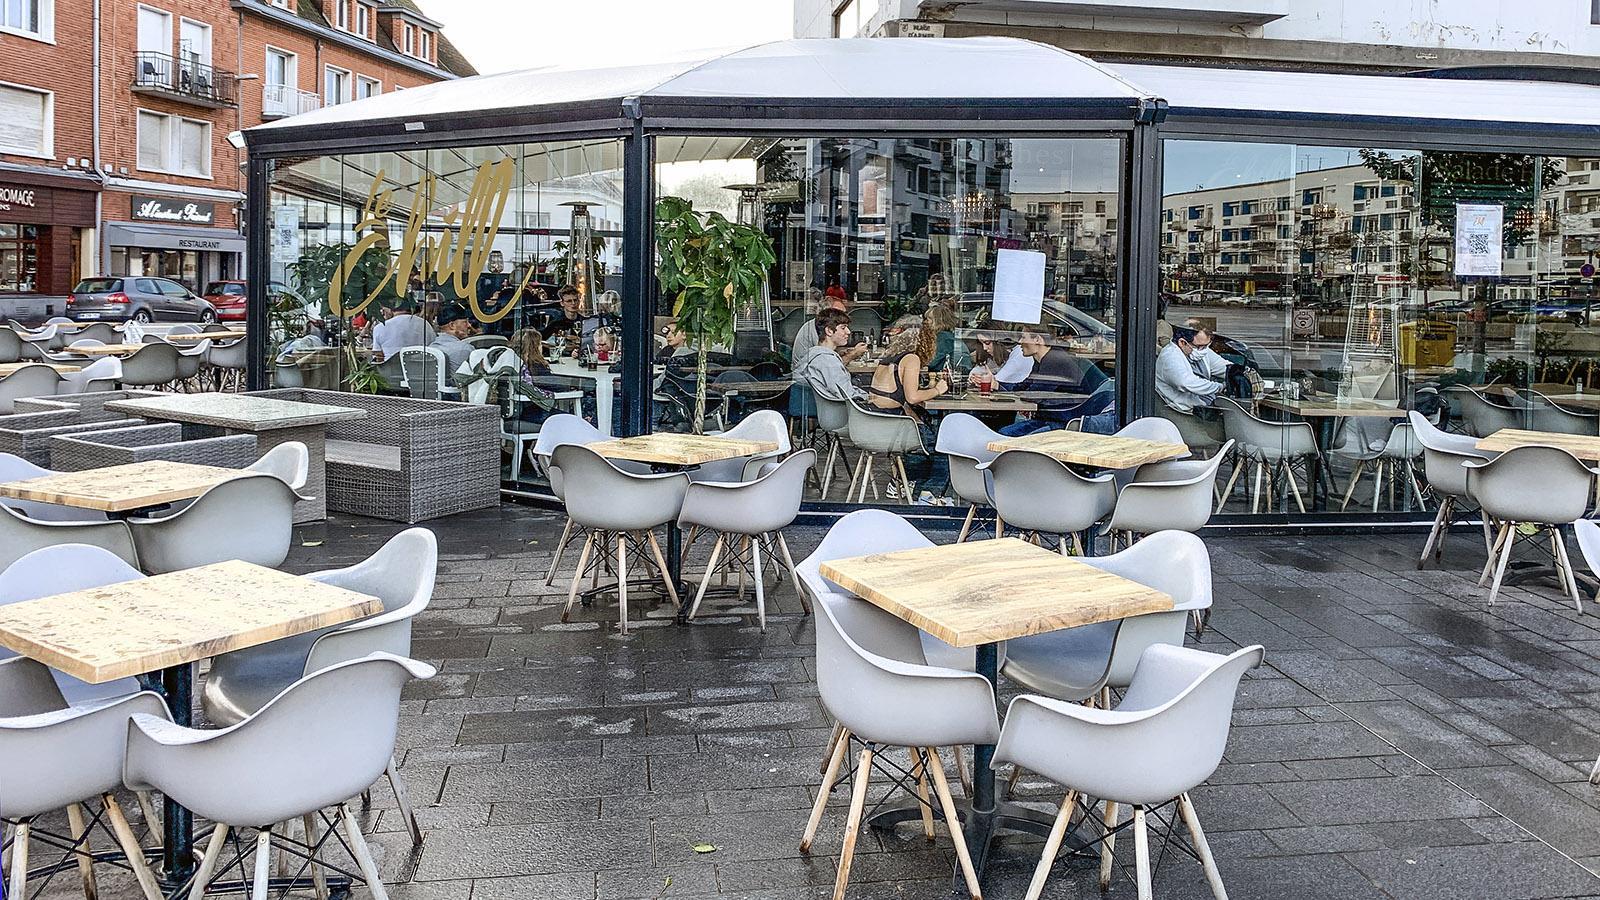 Calais: Café-Restaurant Chill an der Place d'Armes. Foto: Hilke Maunder